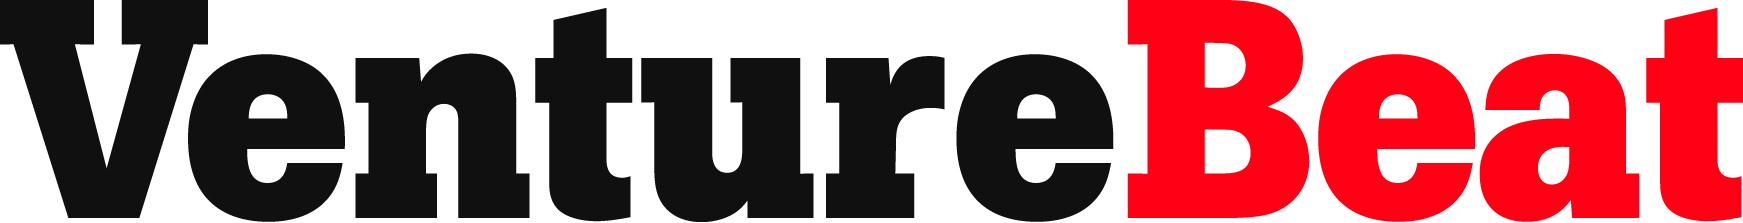 VentureBeat_logo